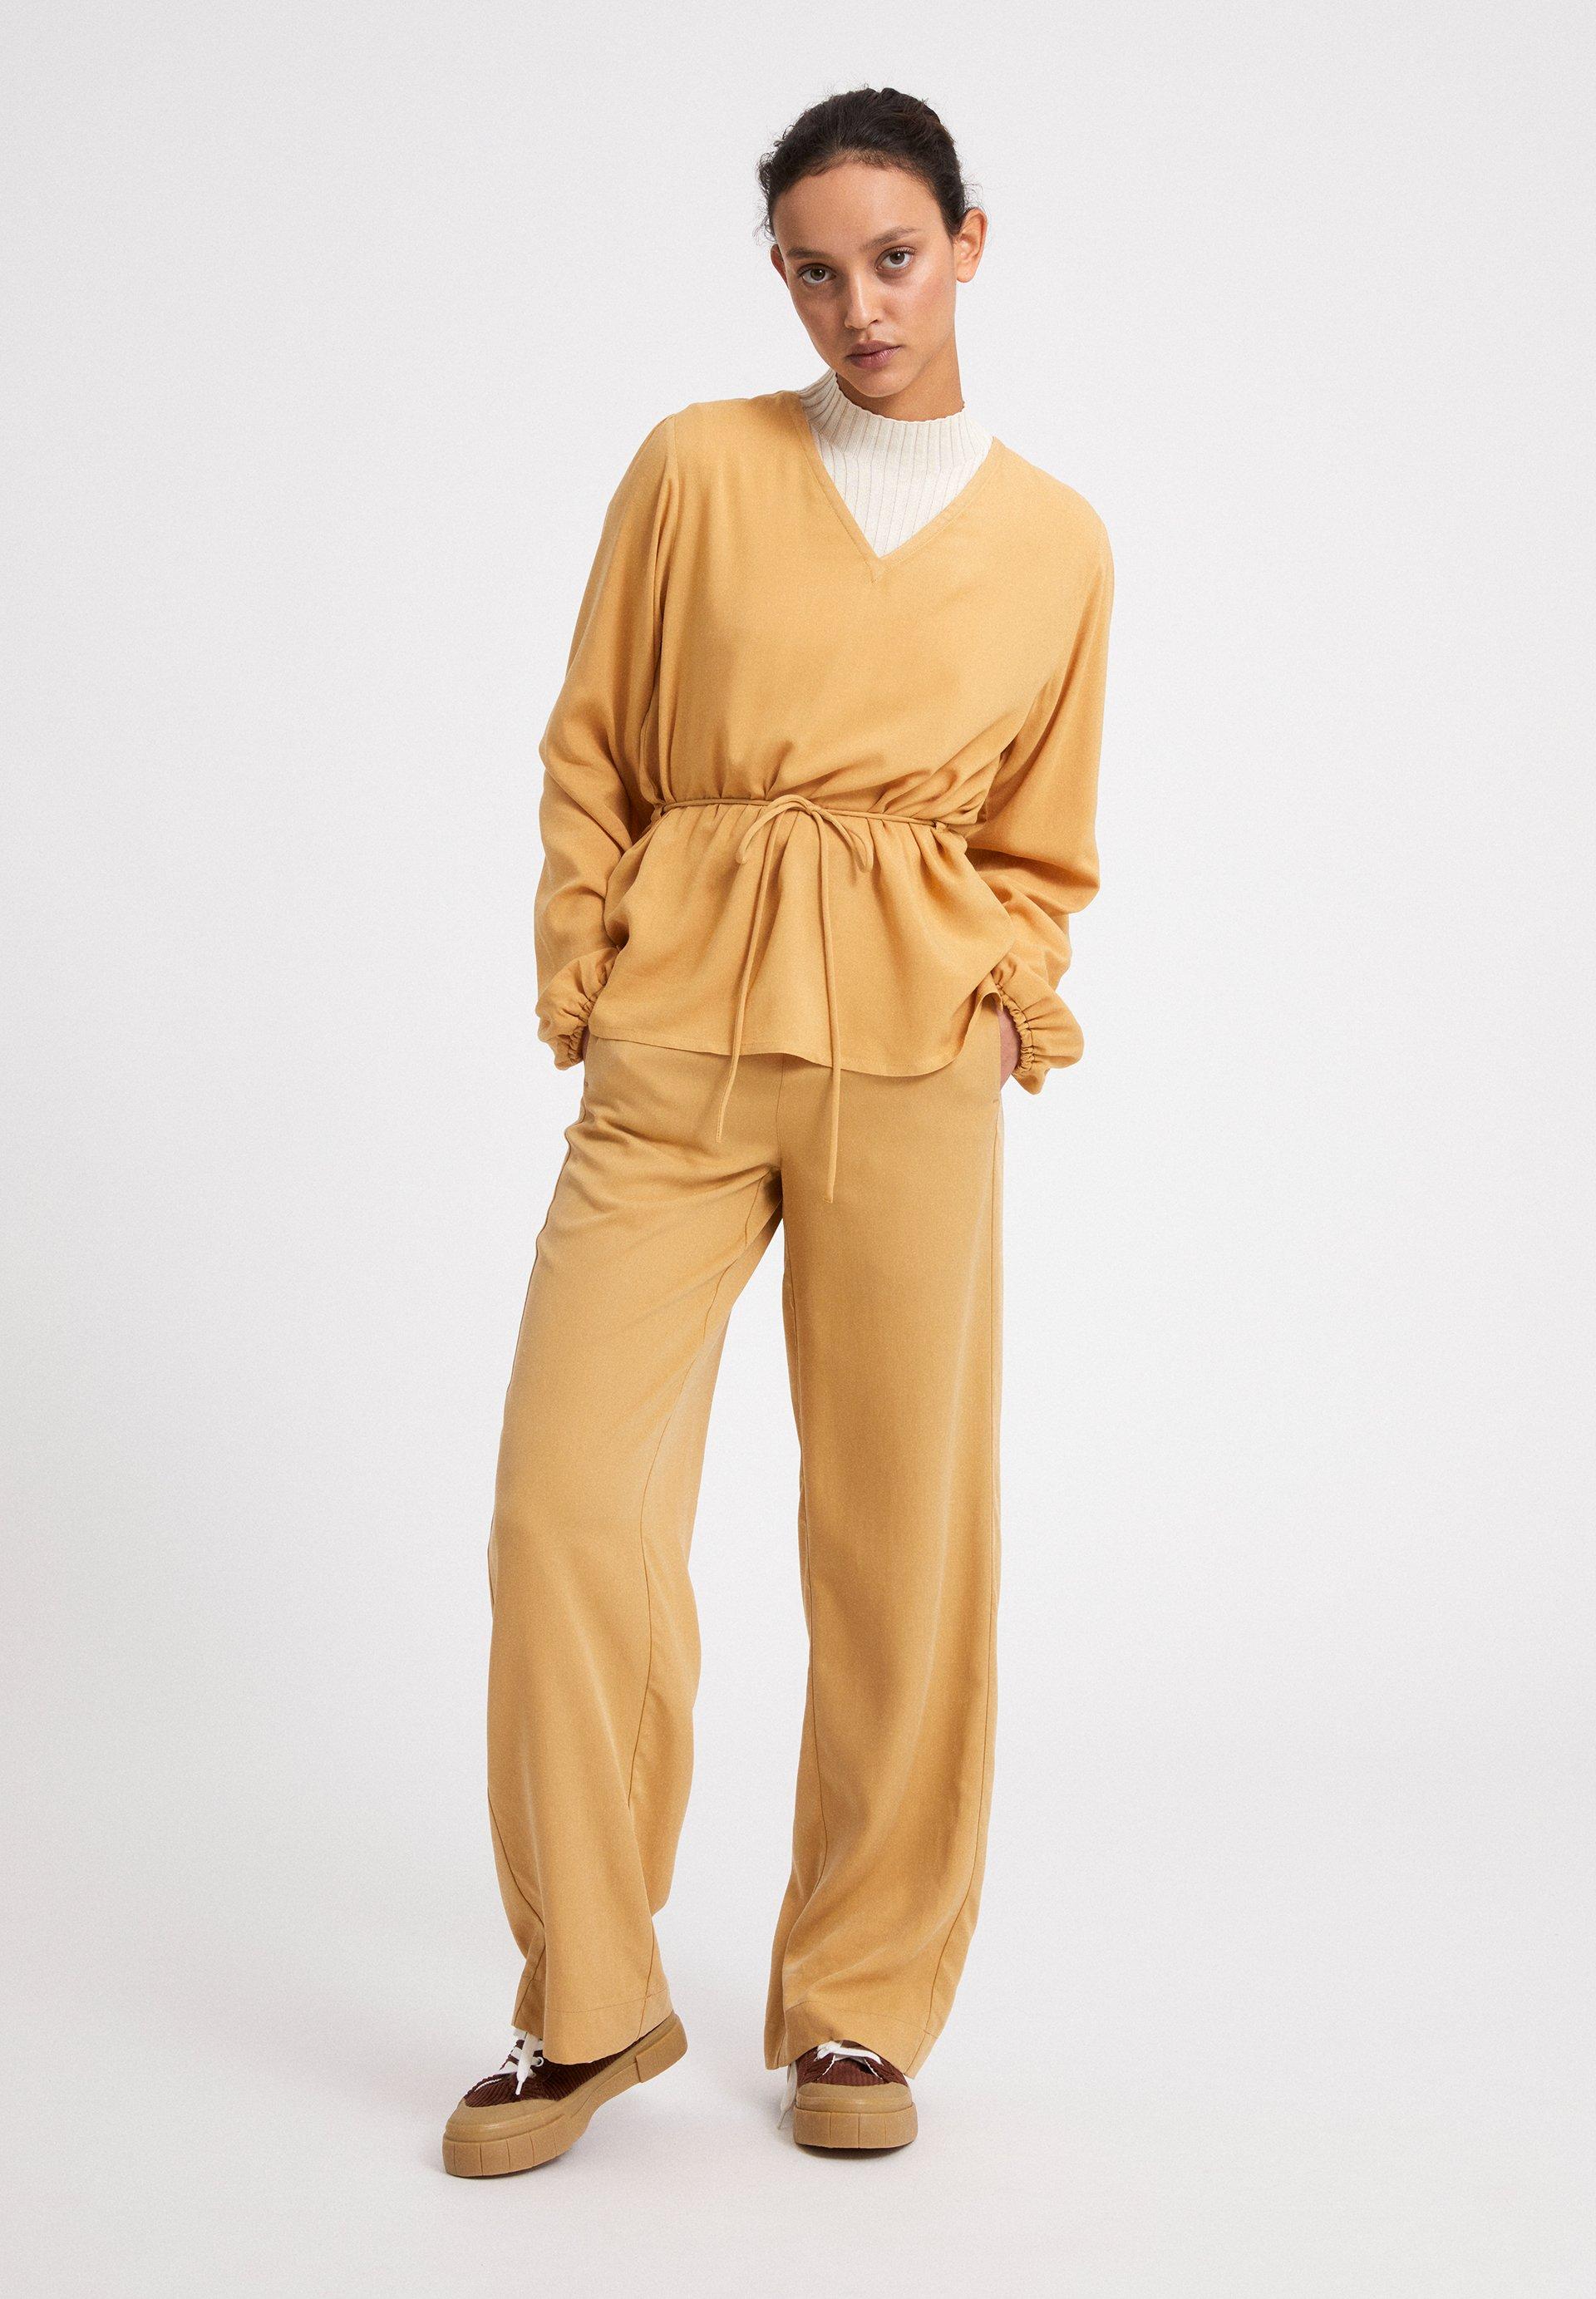 Femme ADRIAA - Robe chemise